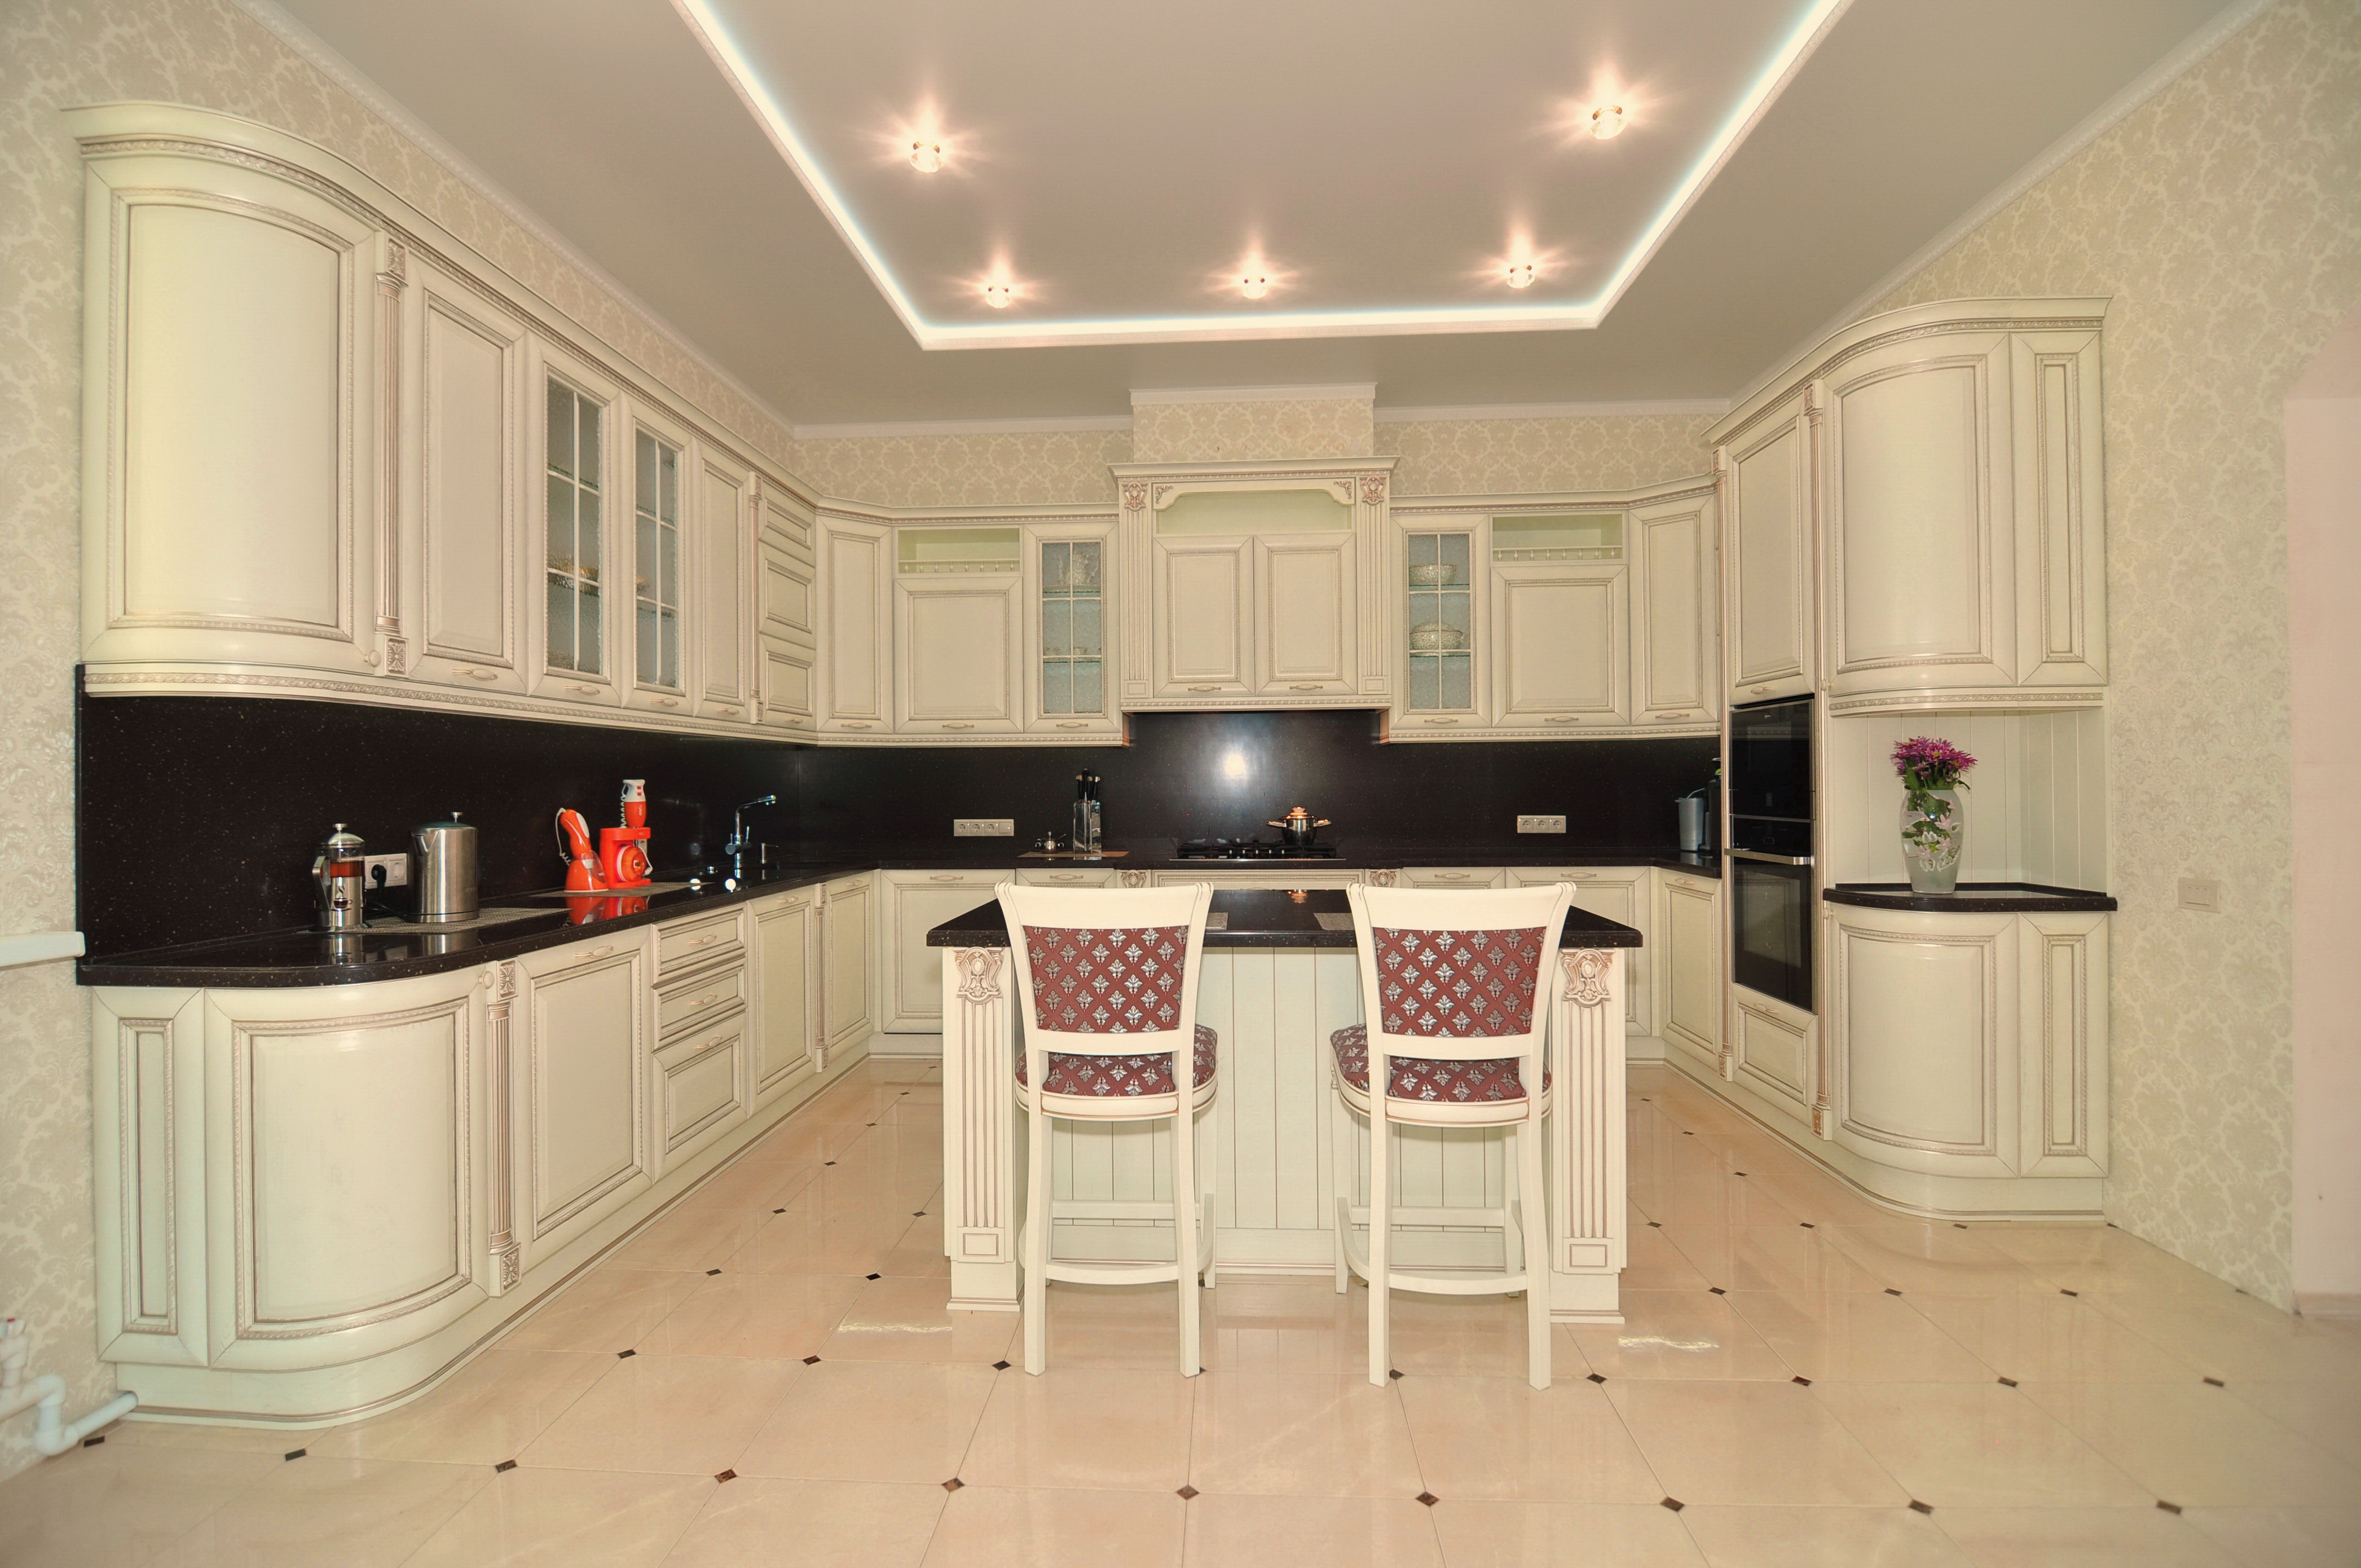 Общий вид кухонного гарнитура